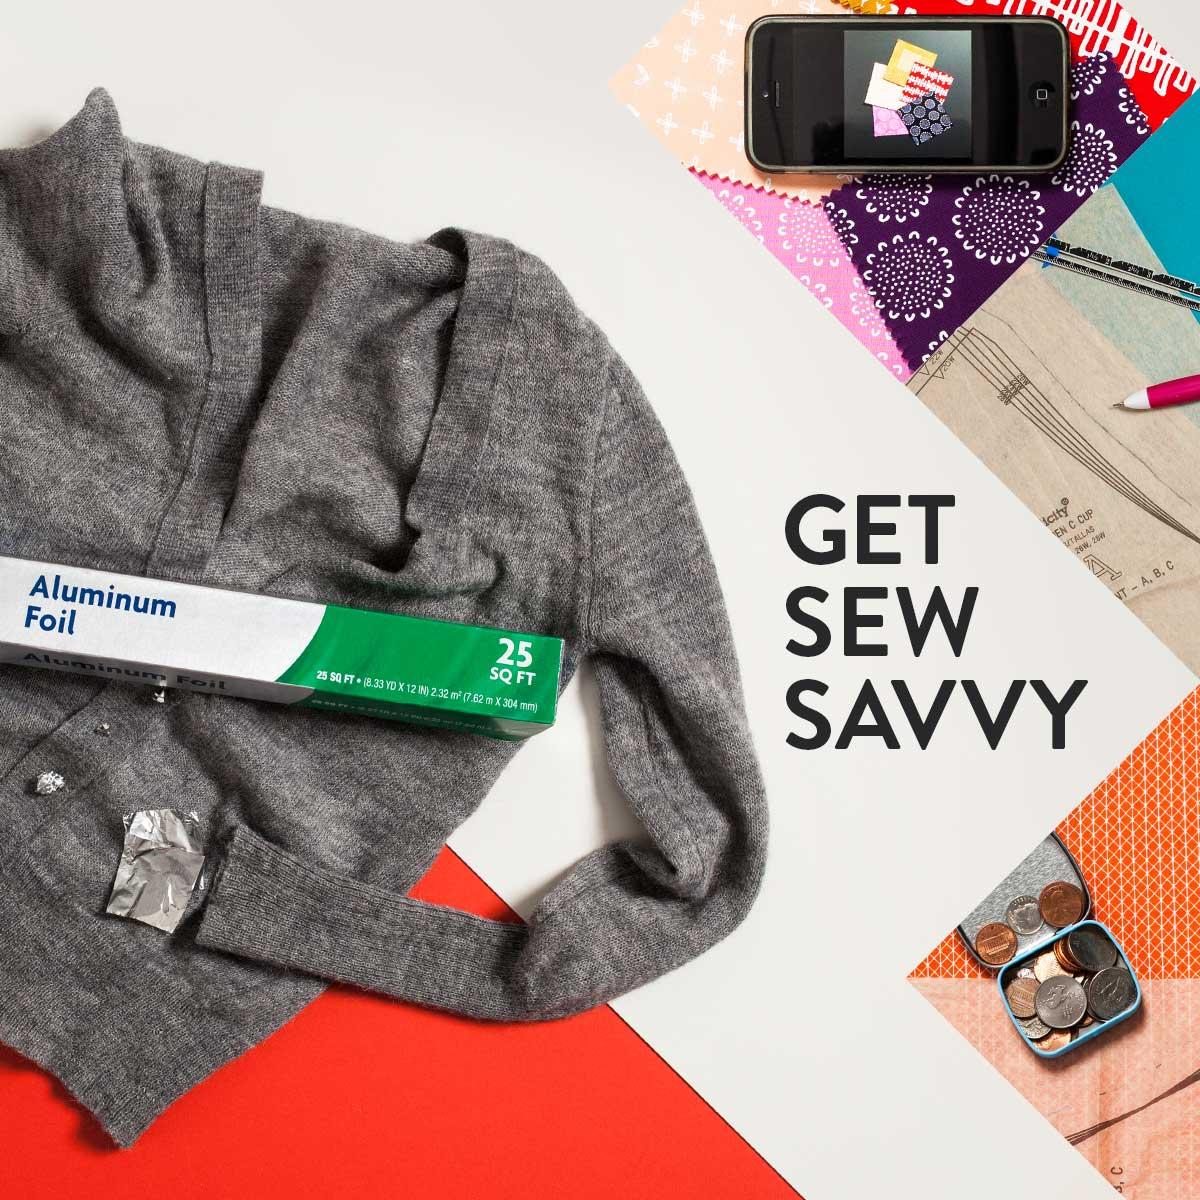 Sew Savvy